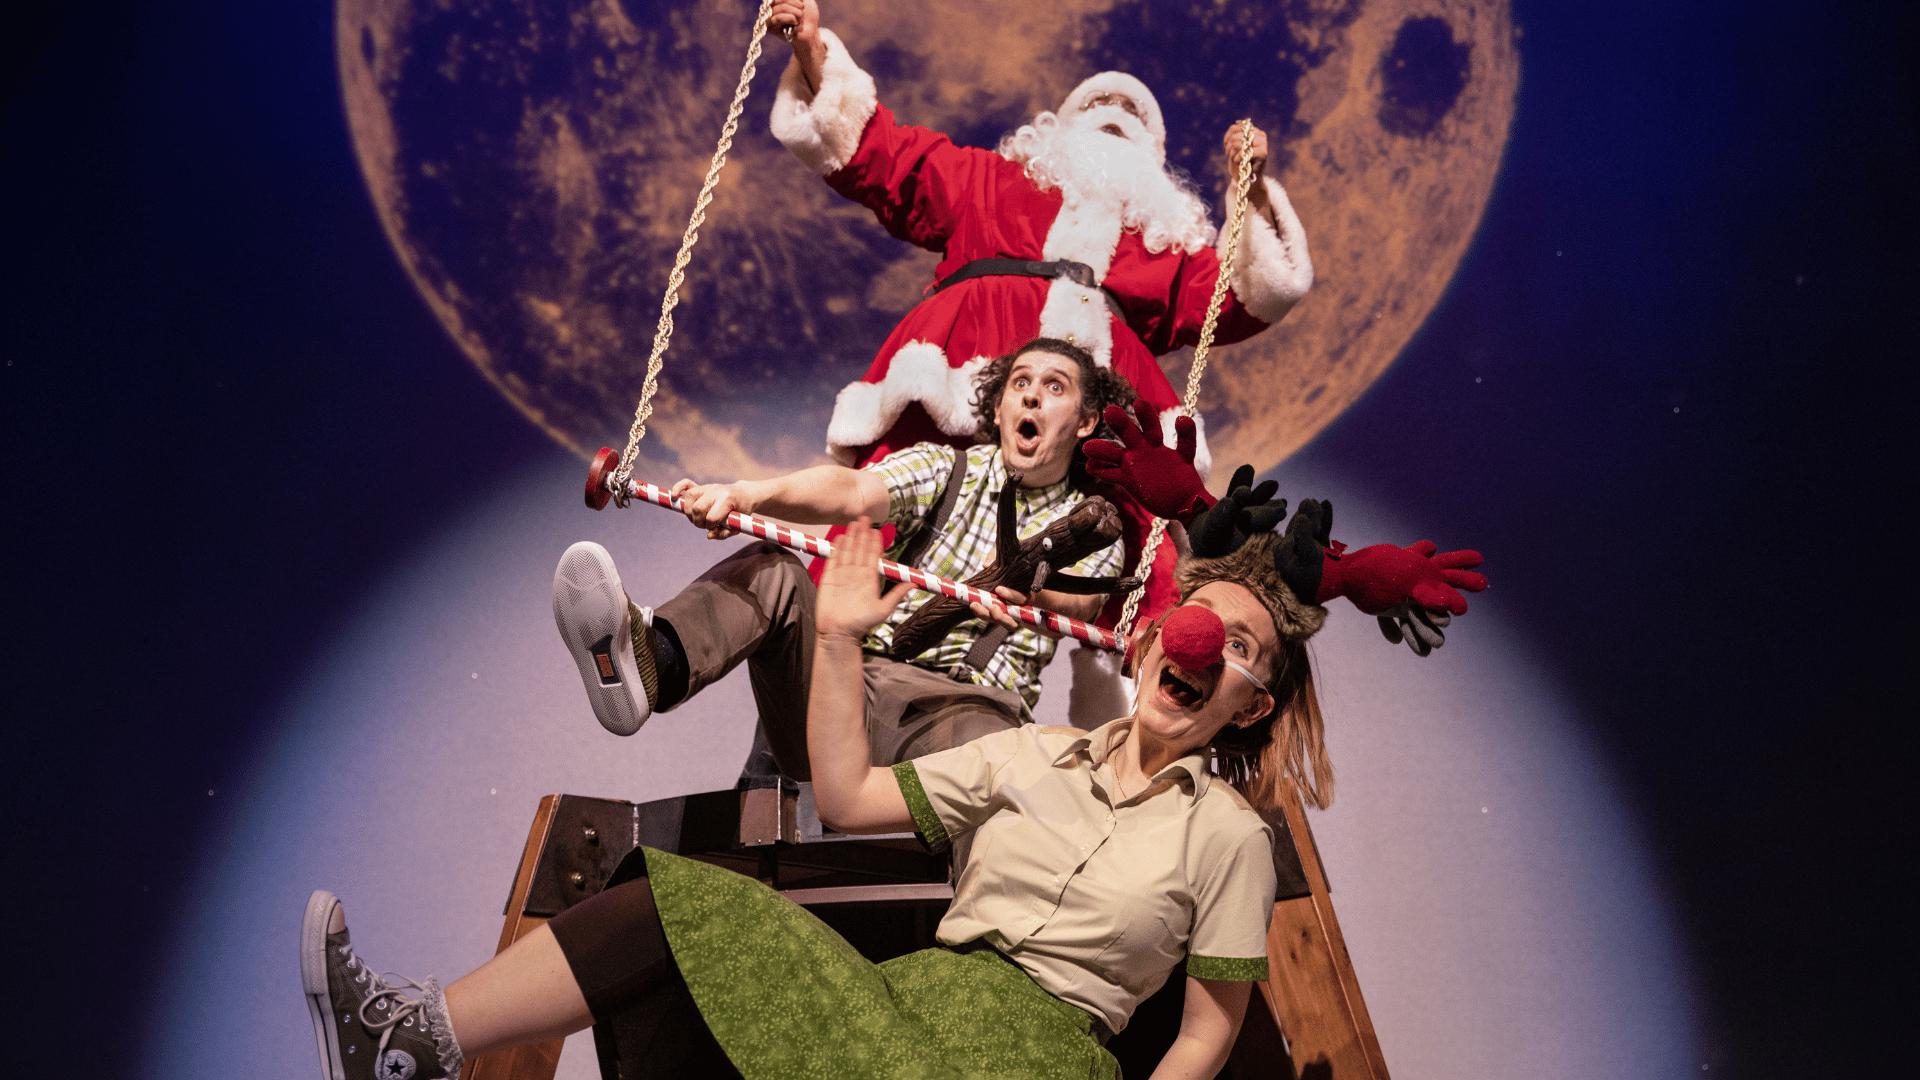 Stick Man, Stick Lady Love and Santa Claus